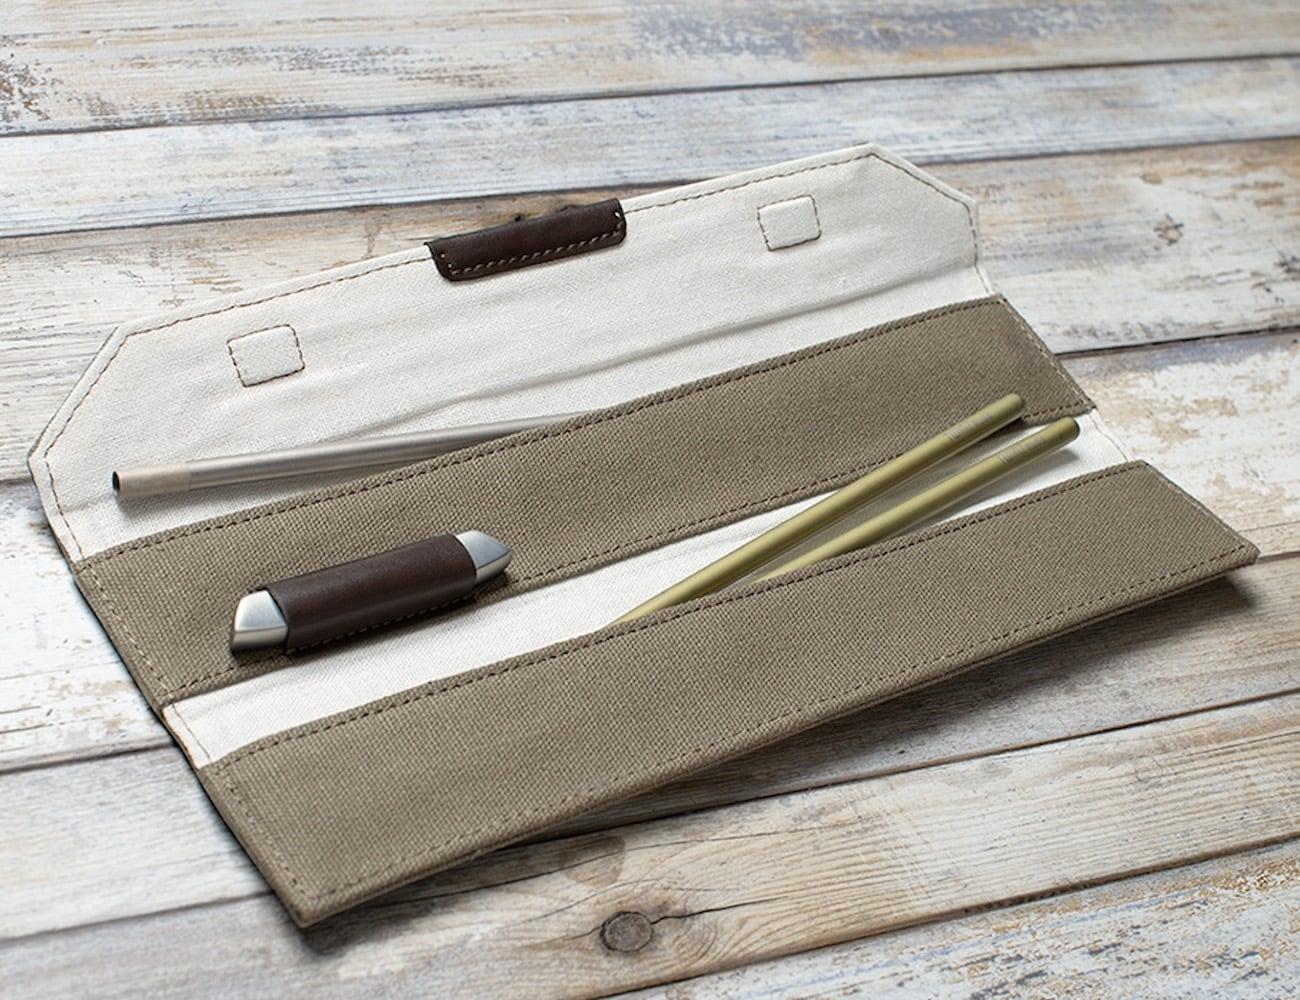 twinz-titanium-chopsticks-deluxe-carrying-pouch